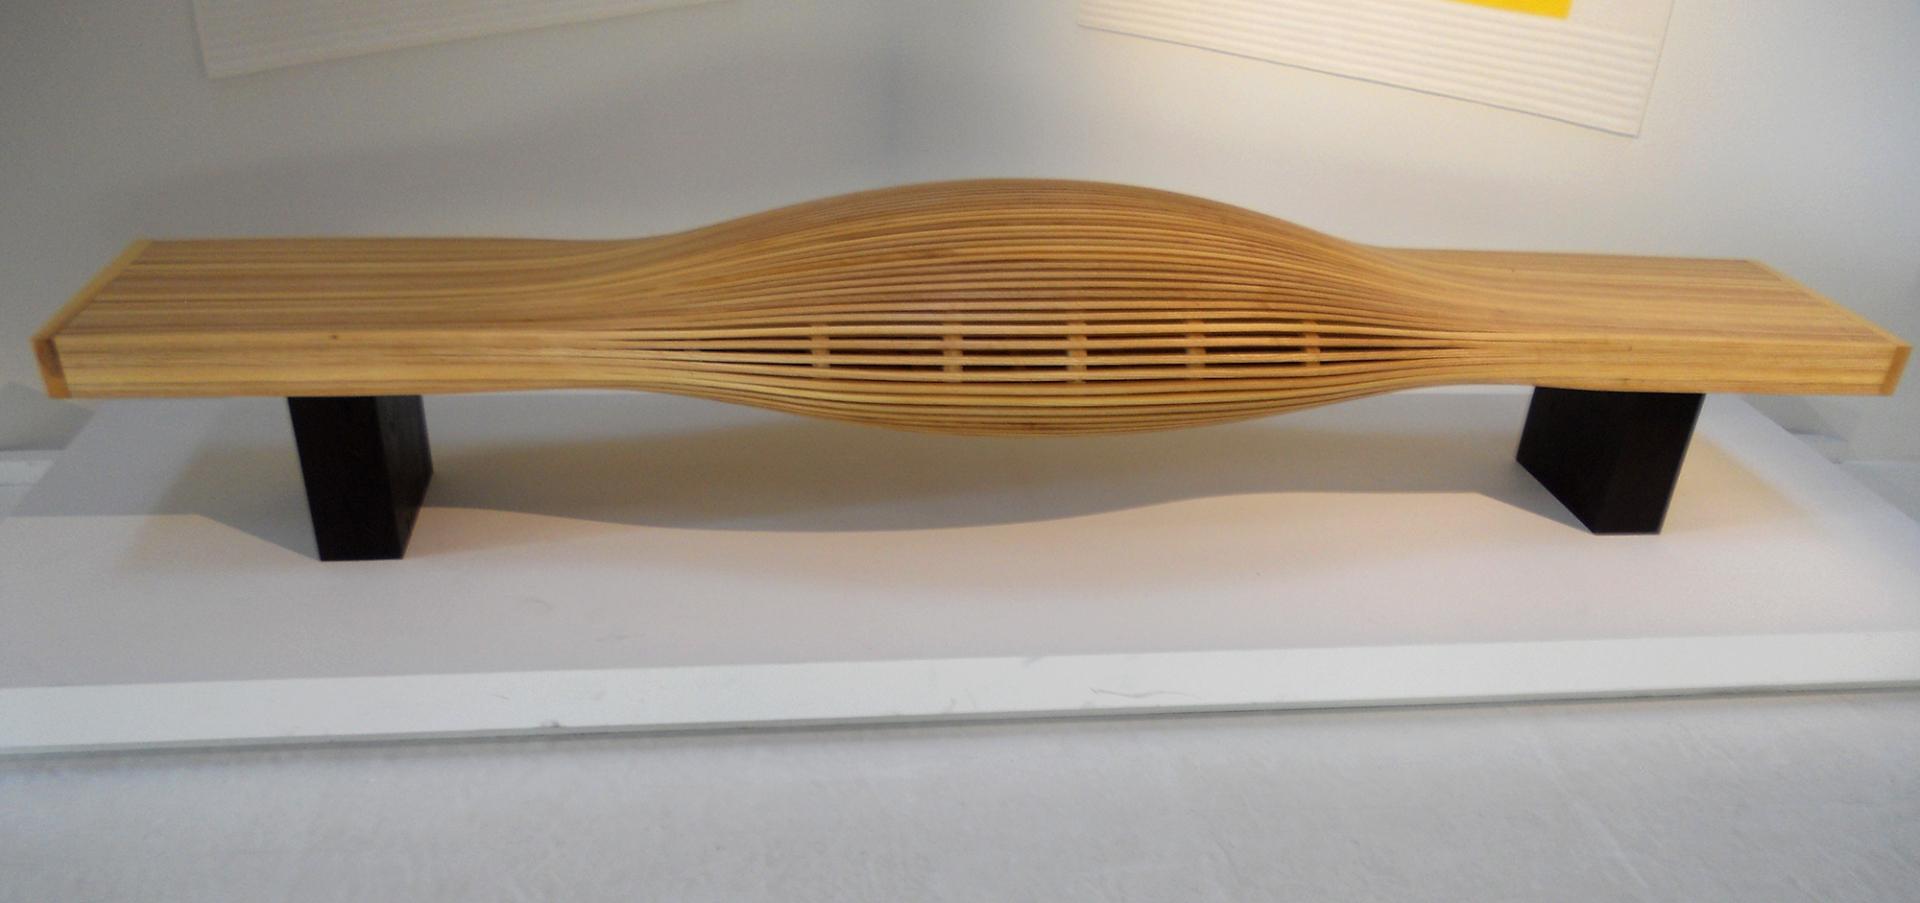 Meditation Bench by Bae Se-hwa